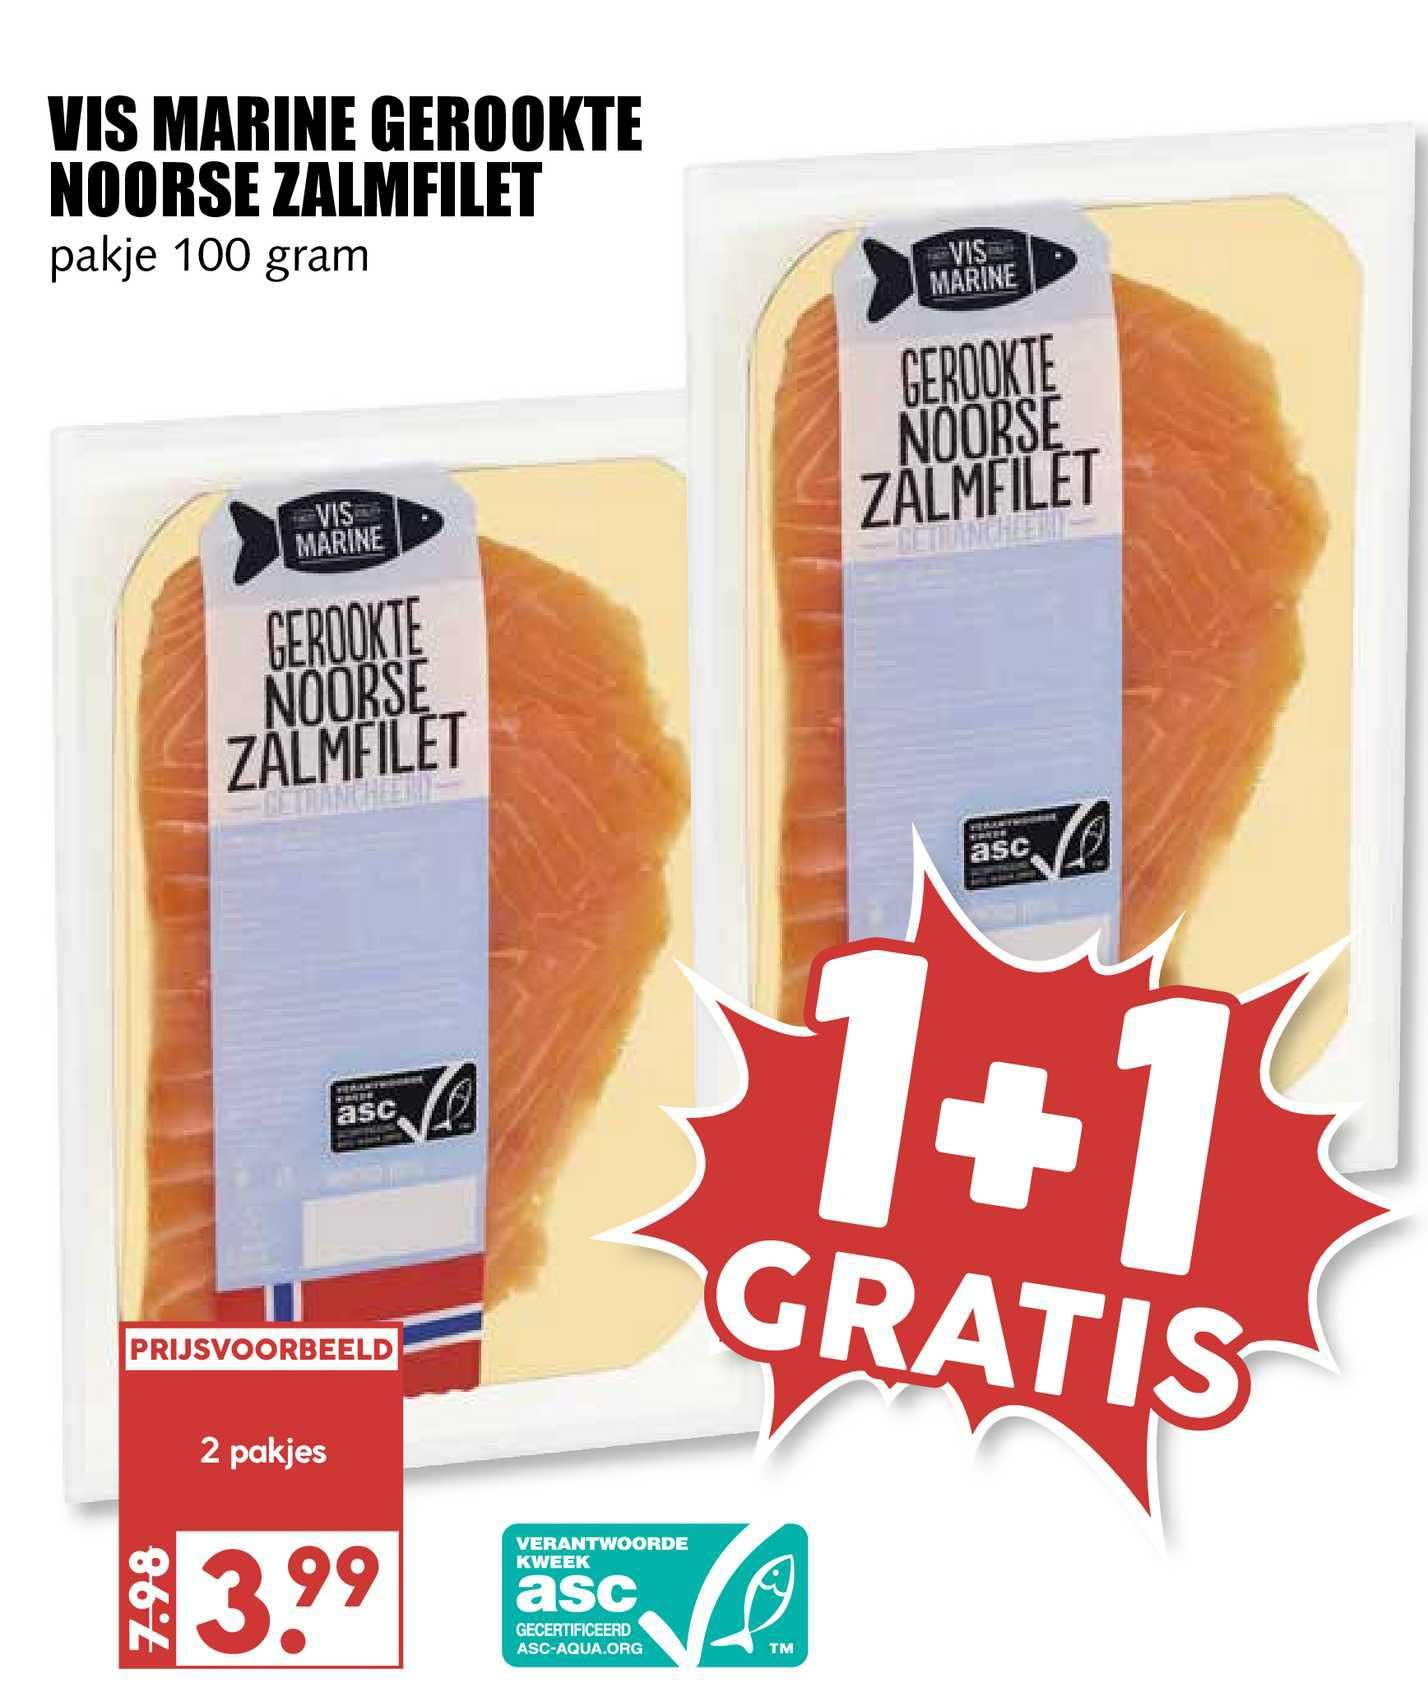 MCD Supermarkt Vis Marine Gerookte Noorse Zalmfilet 1+1 Gratis